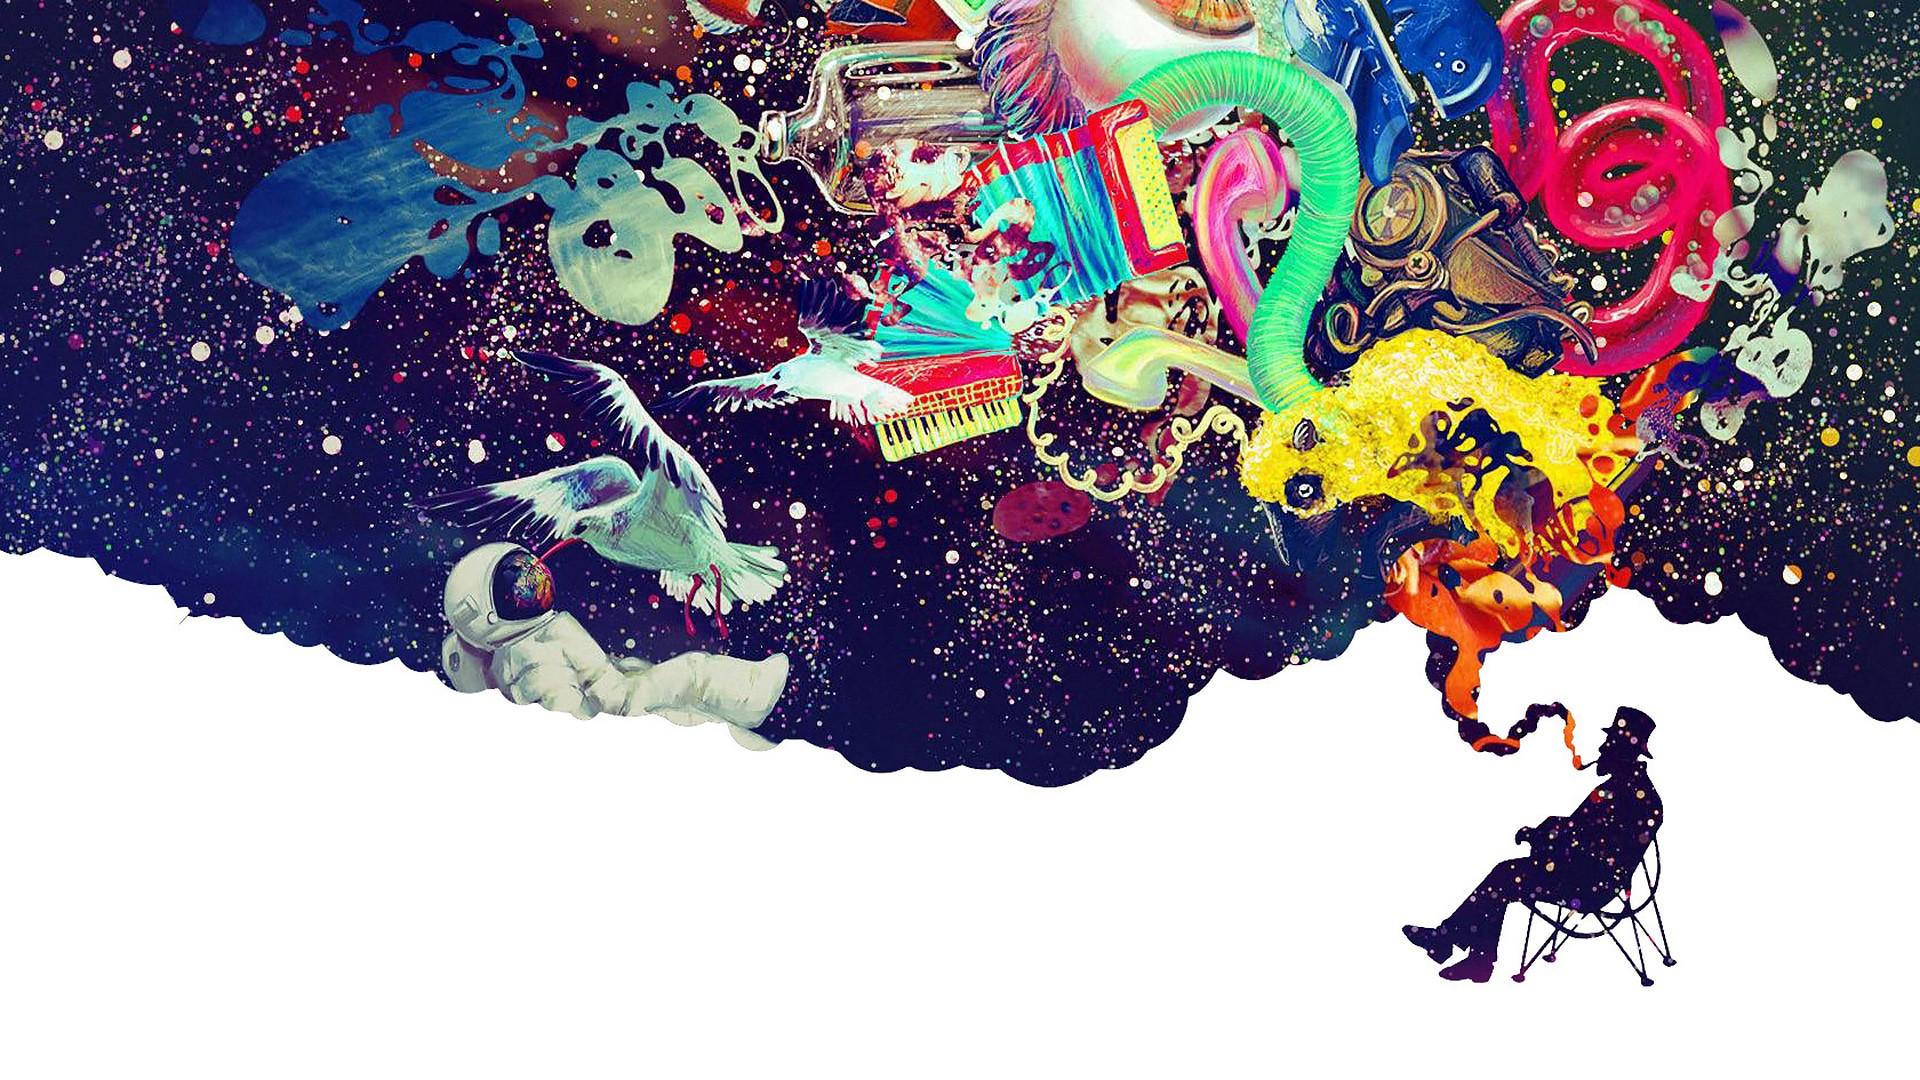 creating a world beyond reality